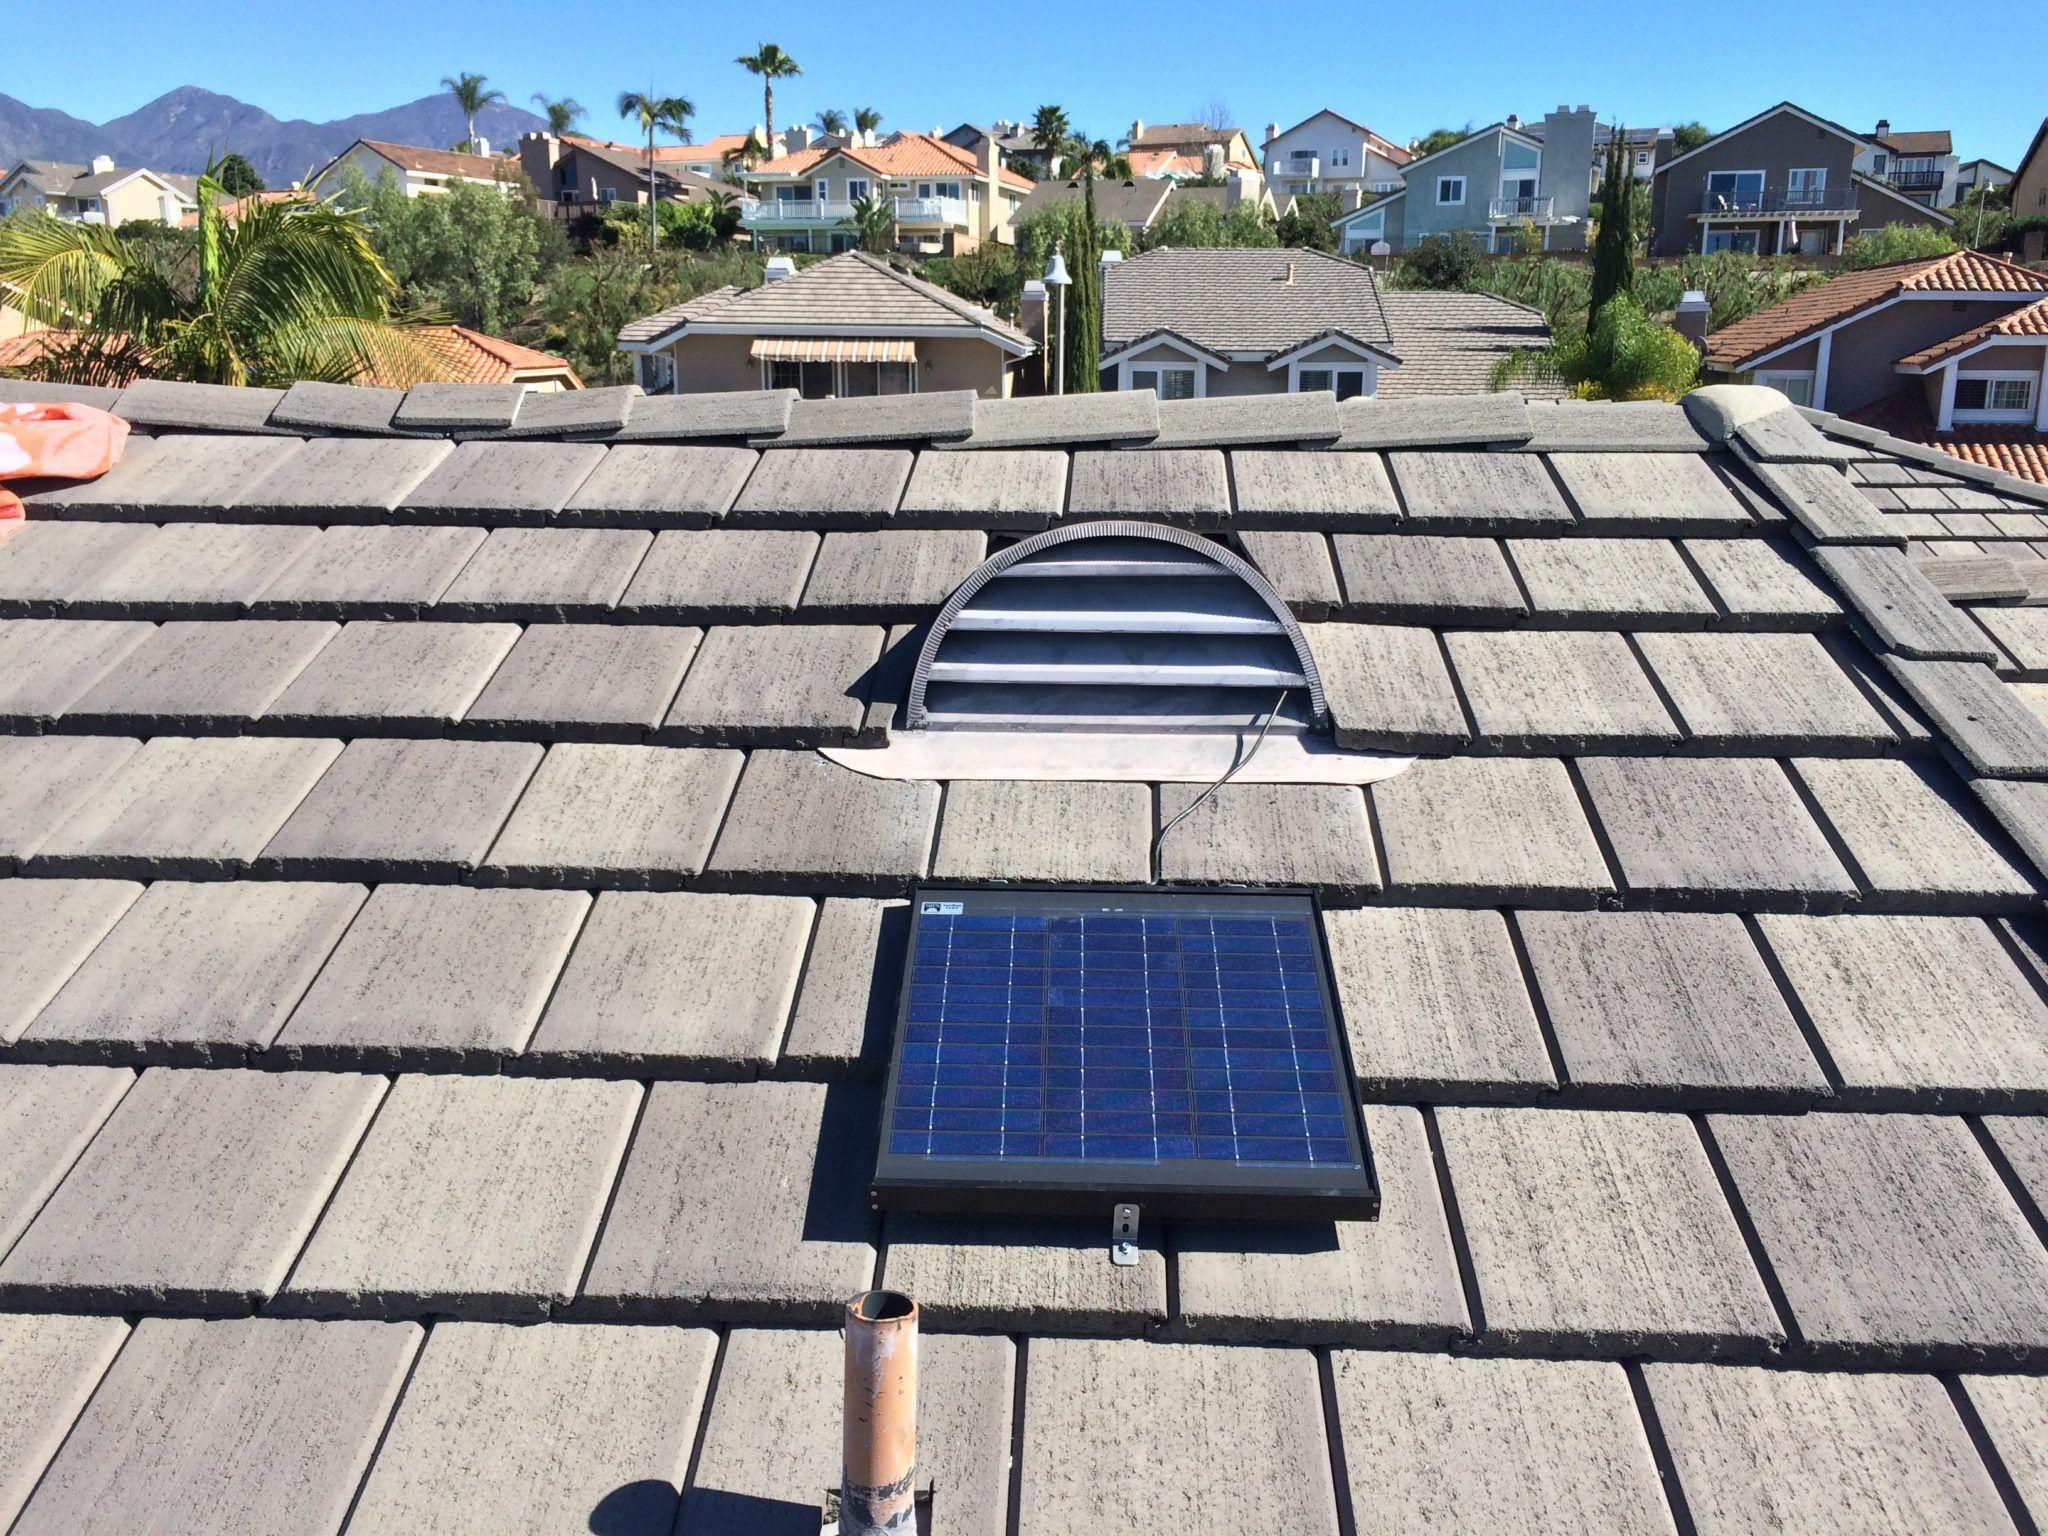 Gable Solar Attic Fan Model Installed From Sunrise Solar Off Grid Solar Panels Off Grid Solar Solar Power House